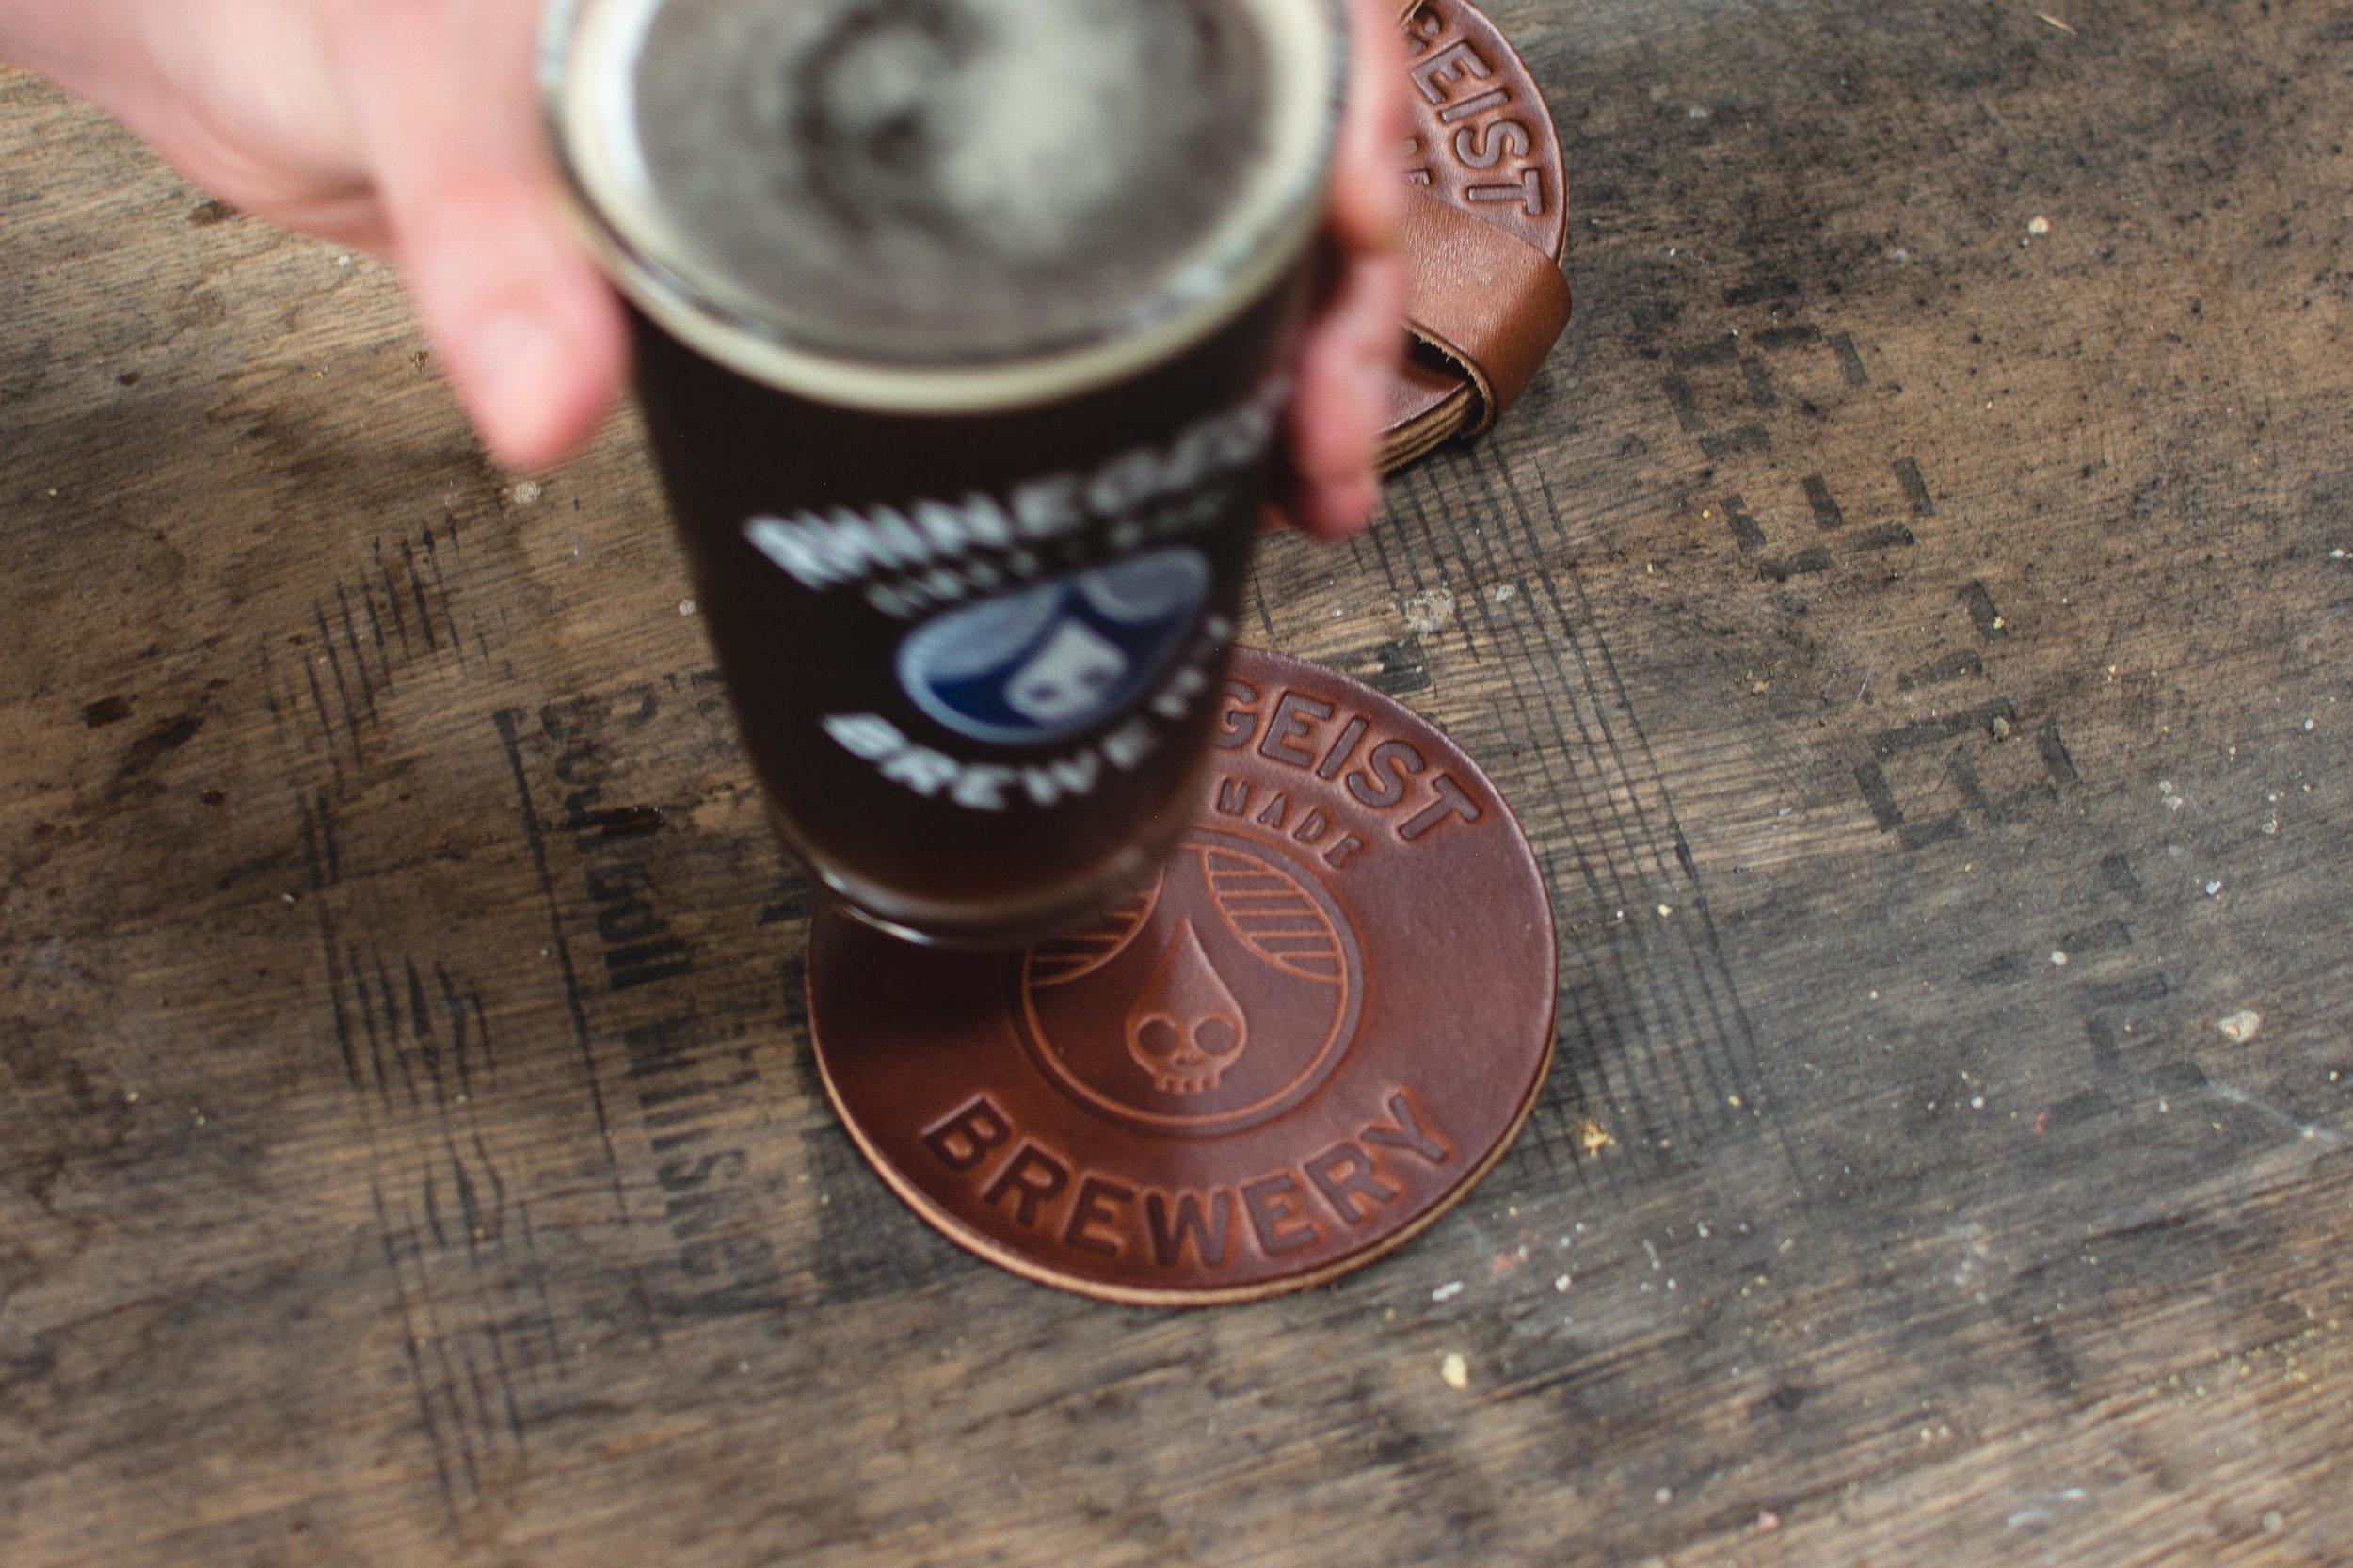 RHINEGEIST - A custom coaster project for Rhinegeist Brewery in downtown Cincinnati, Ohio.